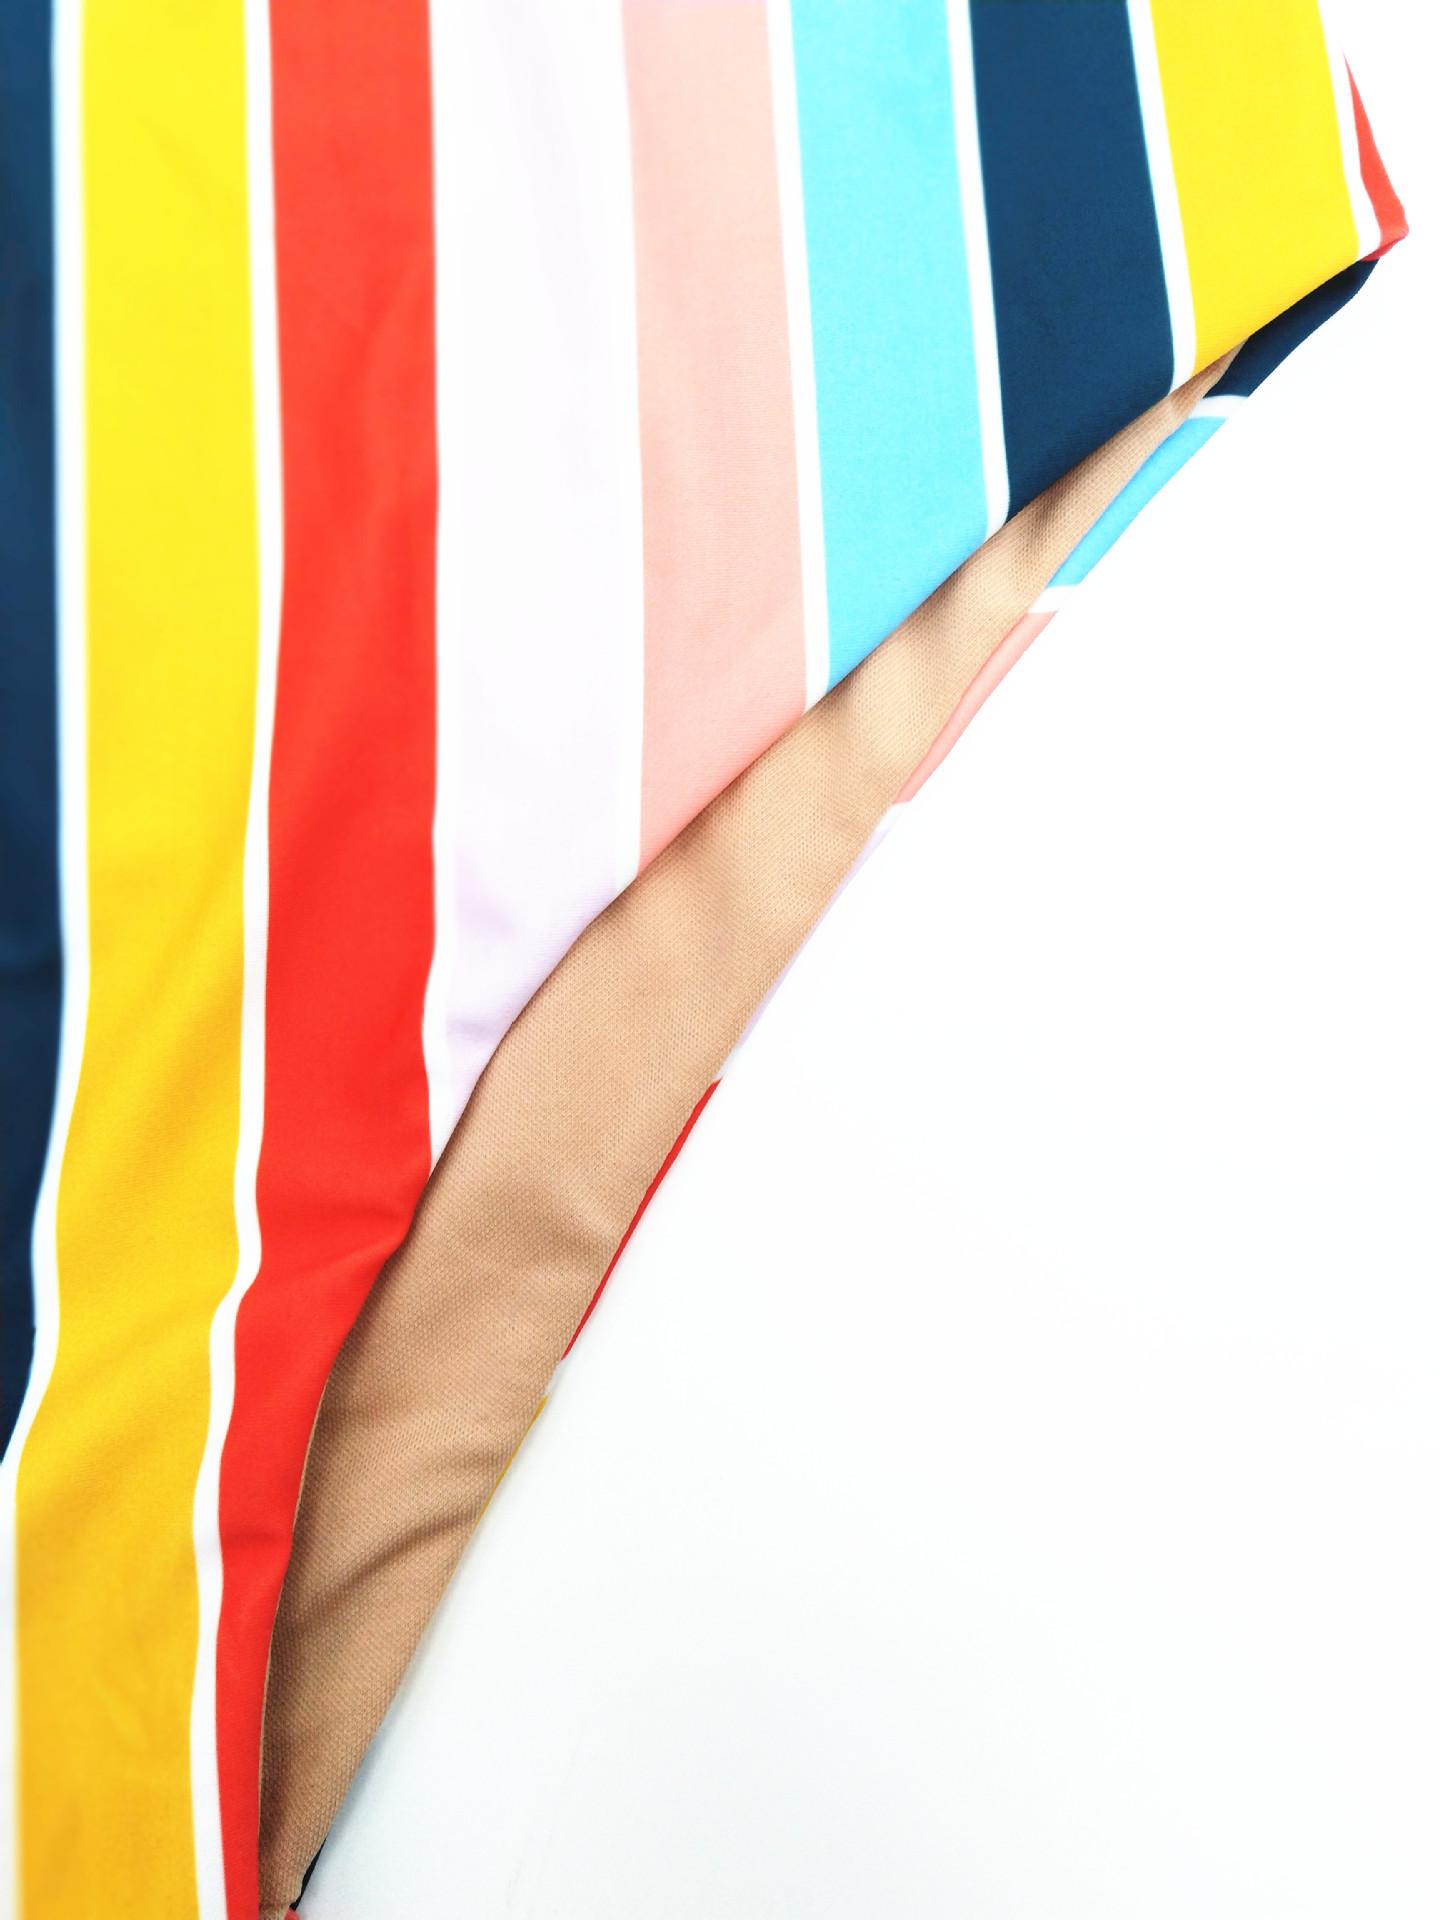 Cotton FashionBikini(Picture color-S)Women Clothing NHWL0197-Picture-color-S